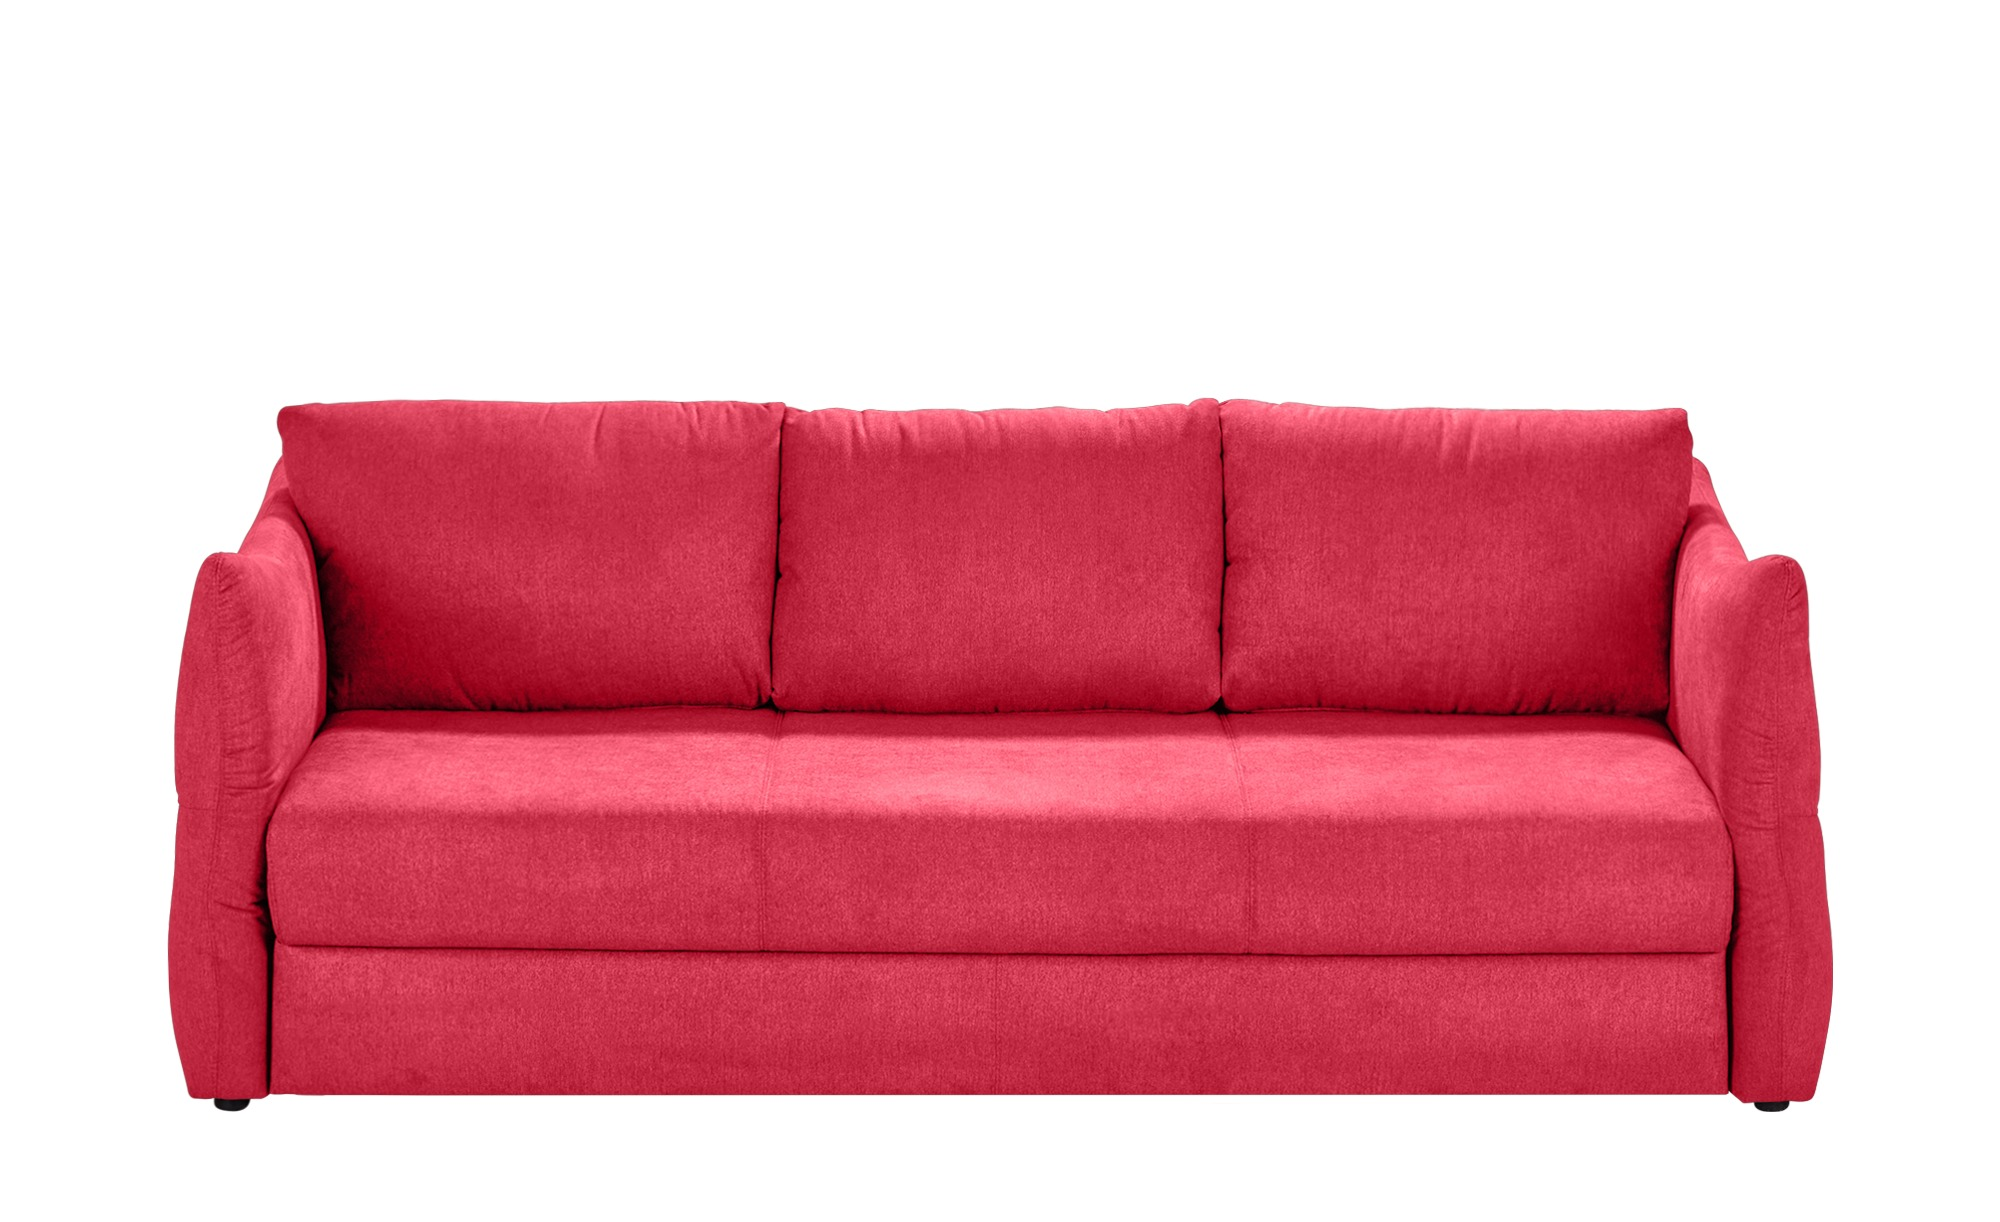 Ecksofa Mit Schlaffunktion Lederimitat Couch Billig Preis Sofa Design Institute Facebook Sofa Sale Online Sin Big Sofa Kaufen Kunstleder Sofa Sofa Design